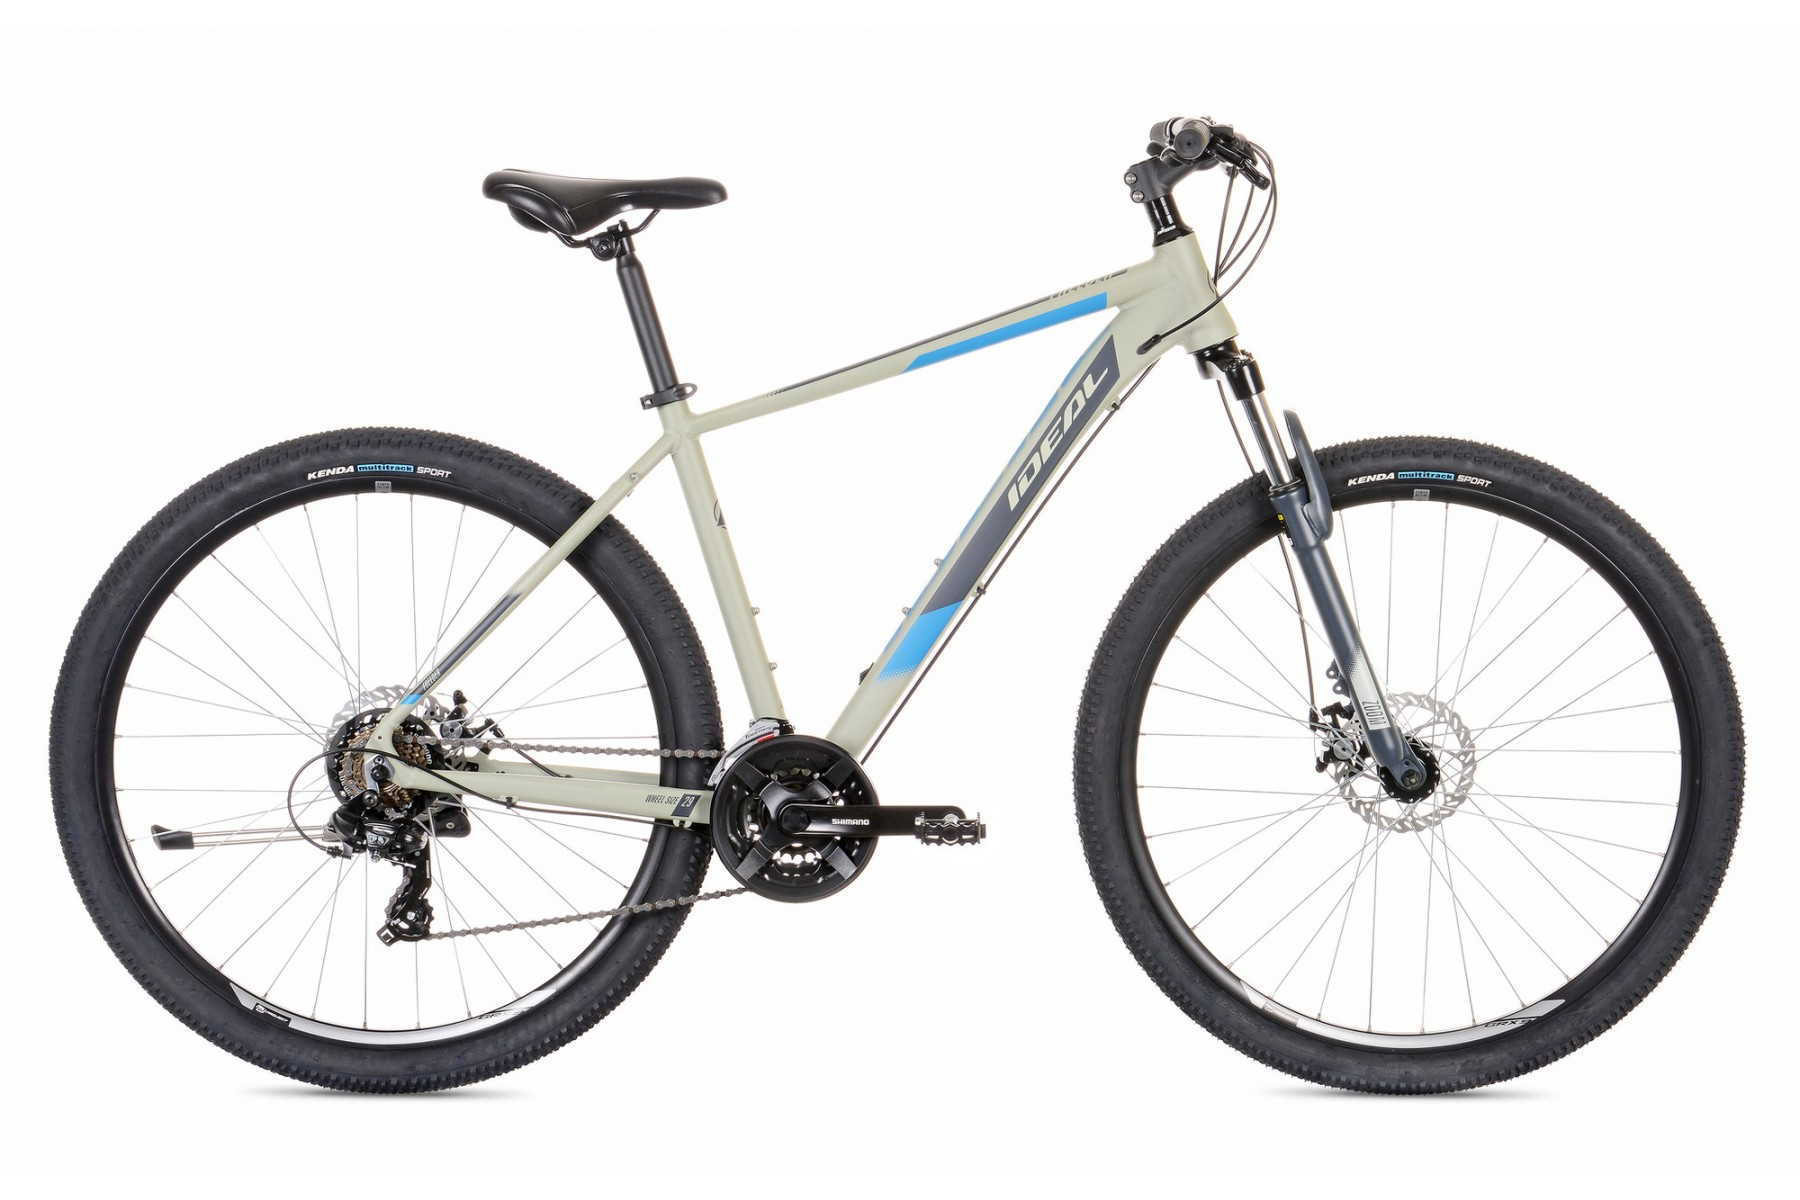 Ideal Orama 427-E10 L Pedelec Bicycle